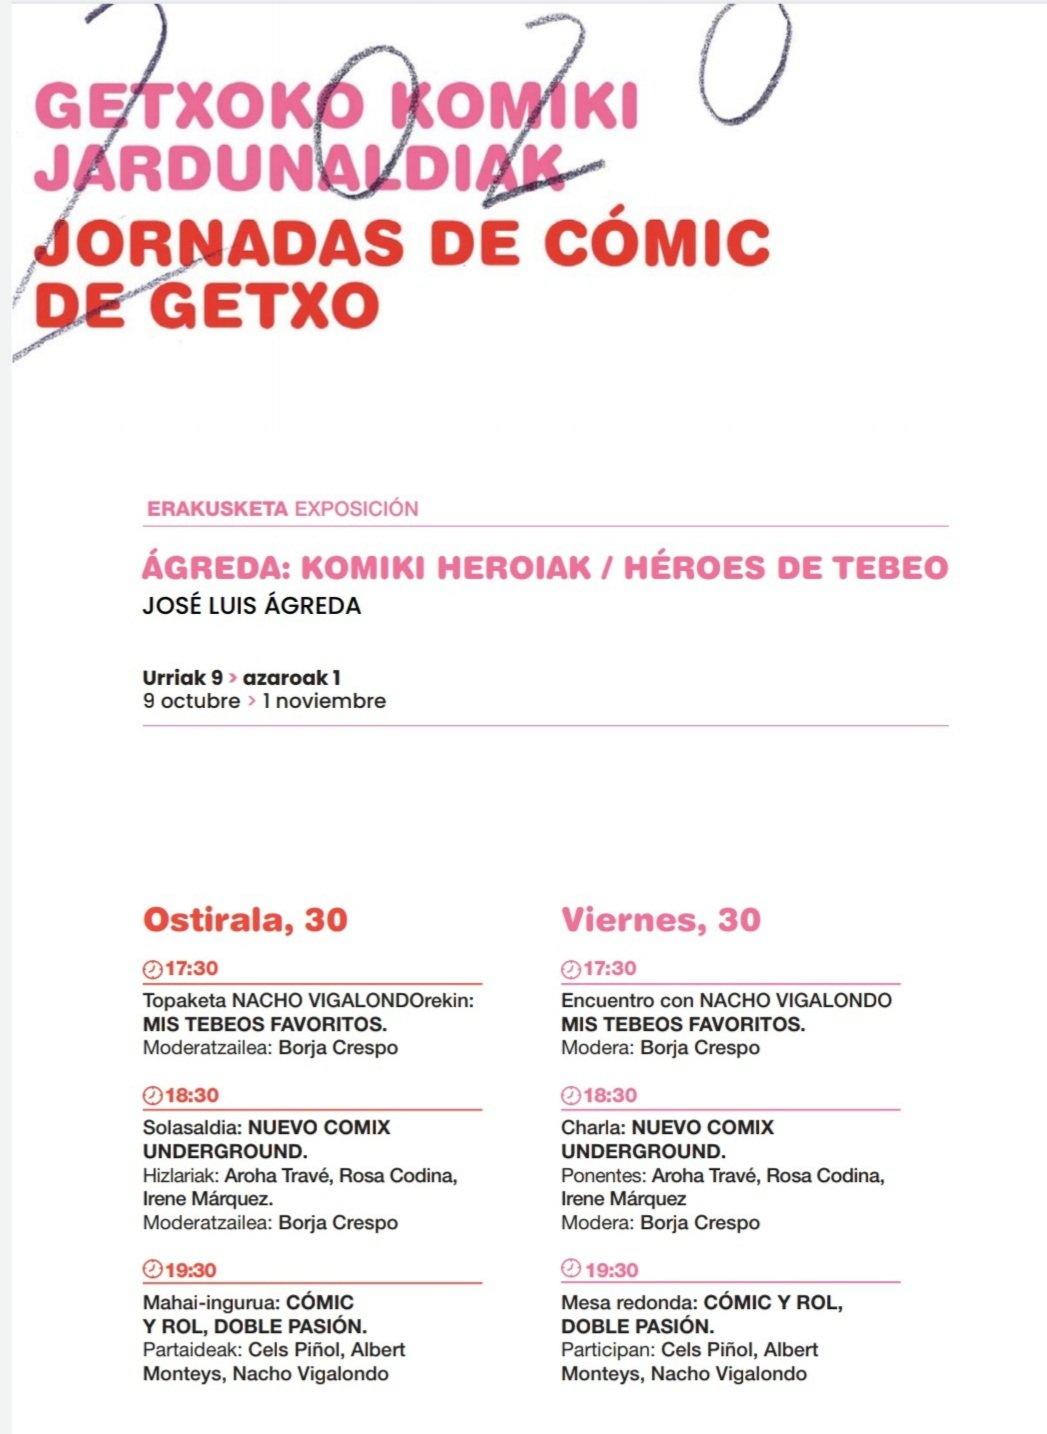 jornadas de cómic de Getxo